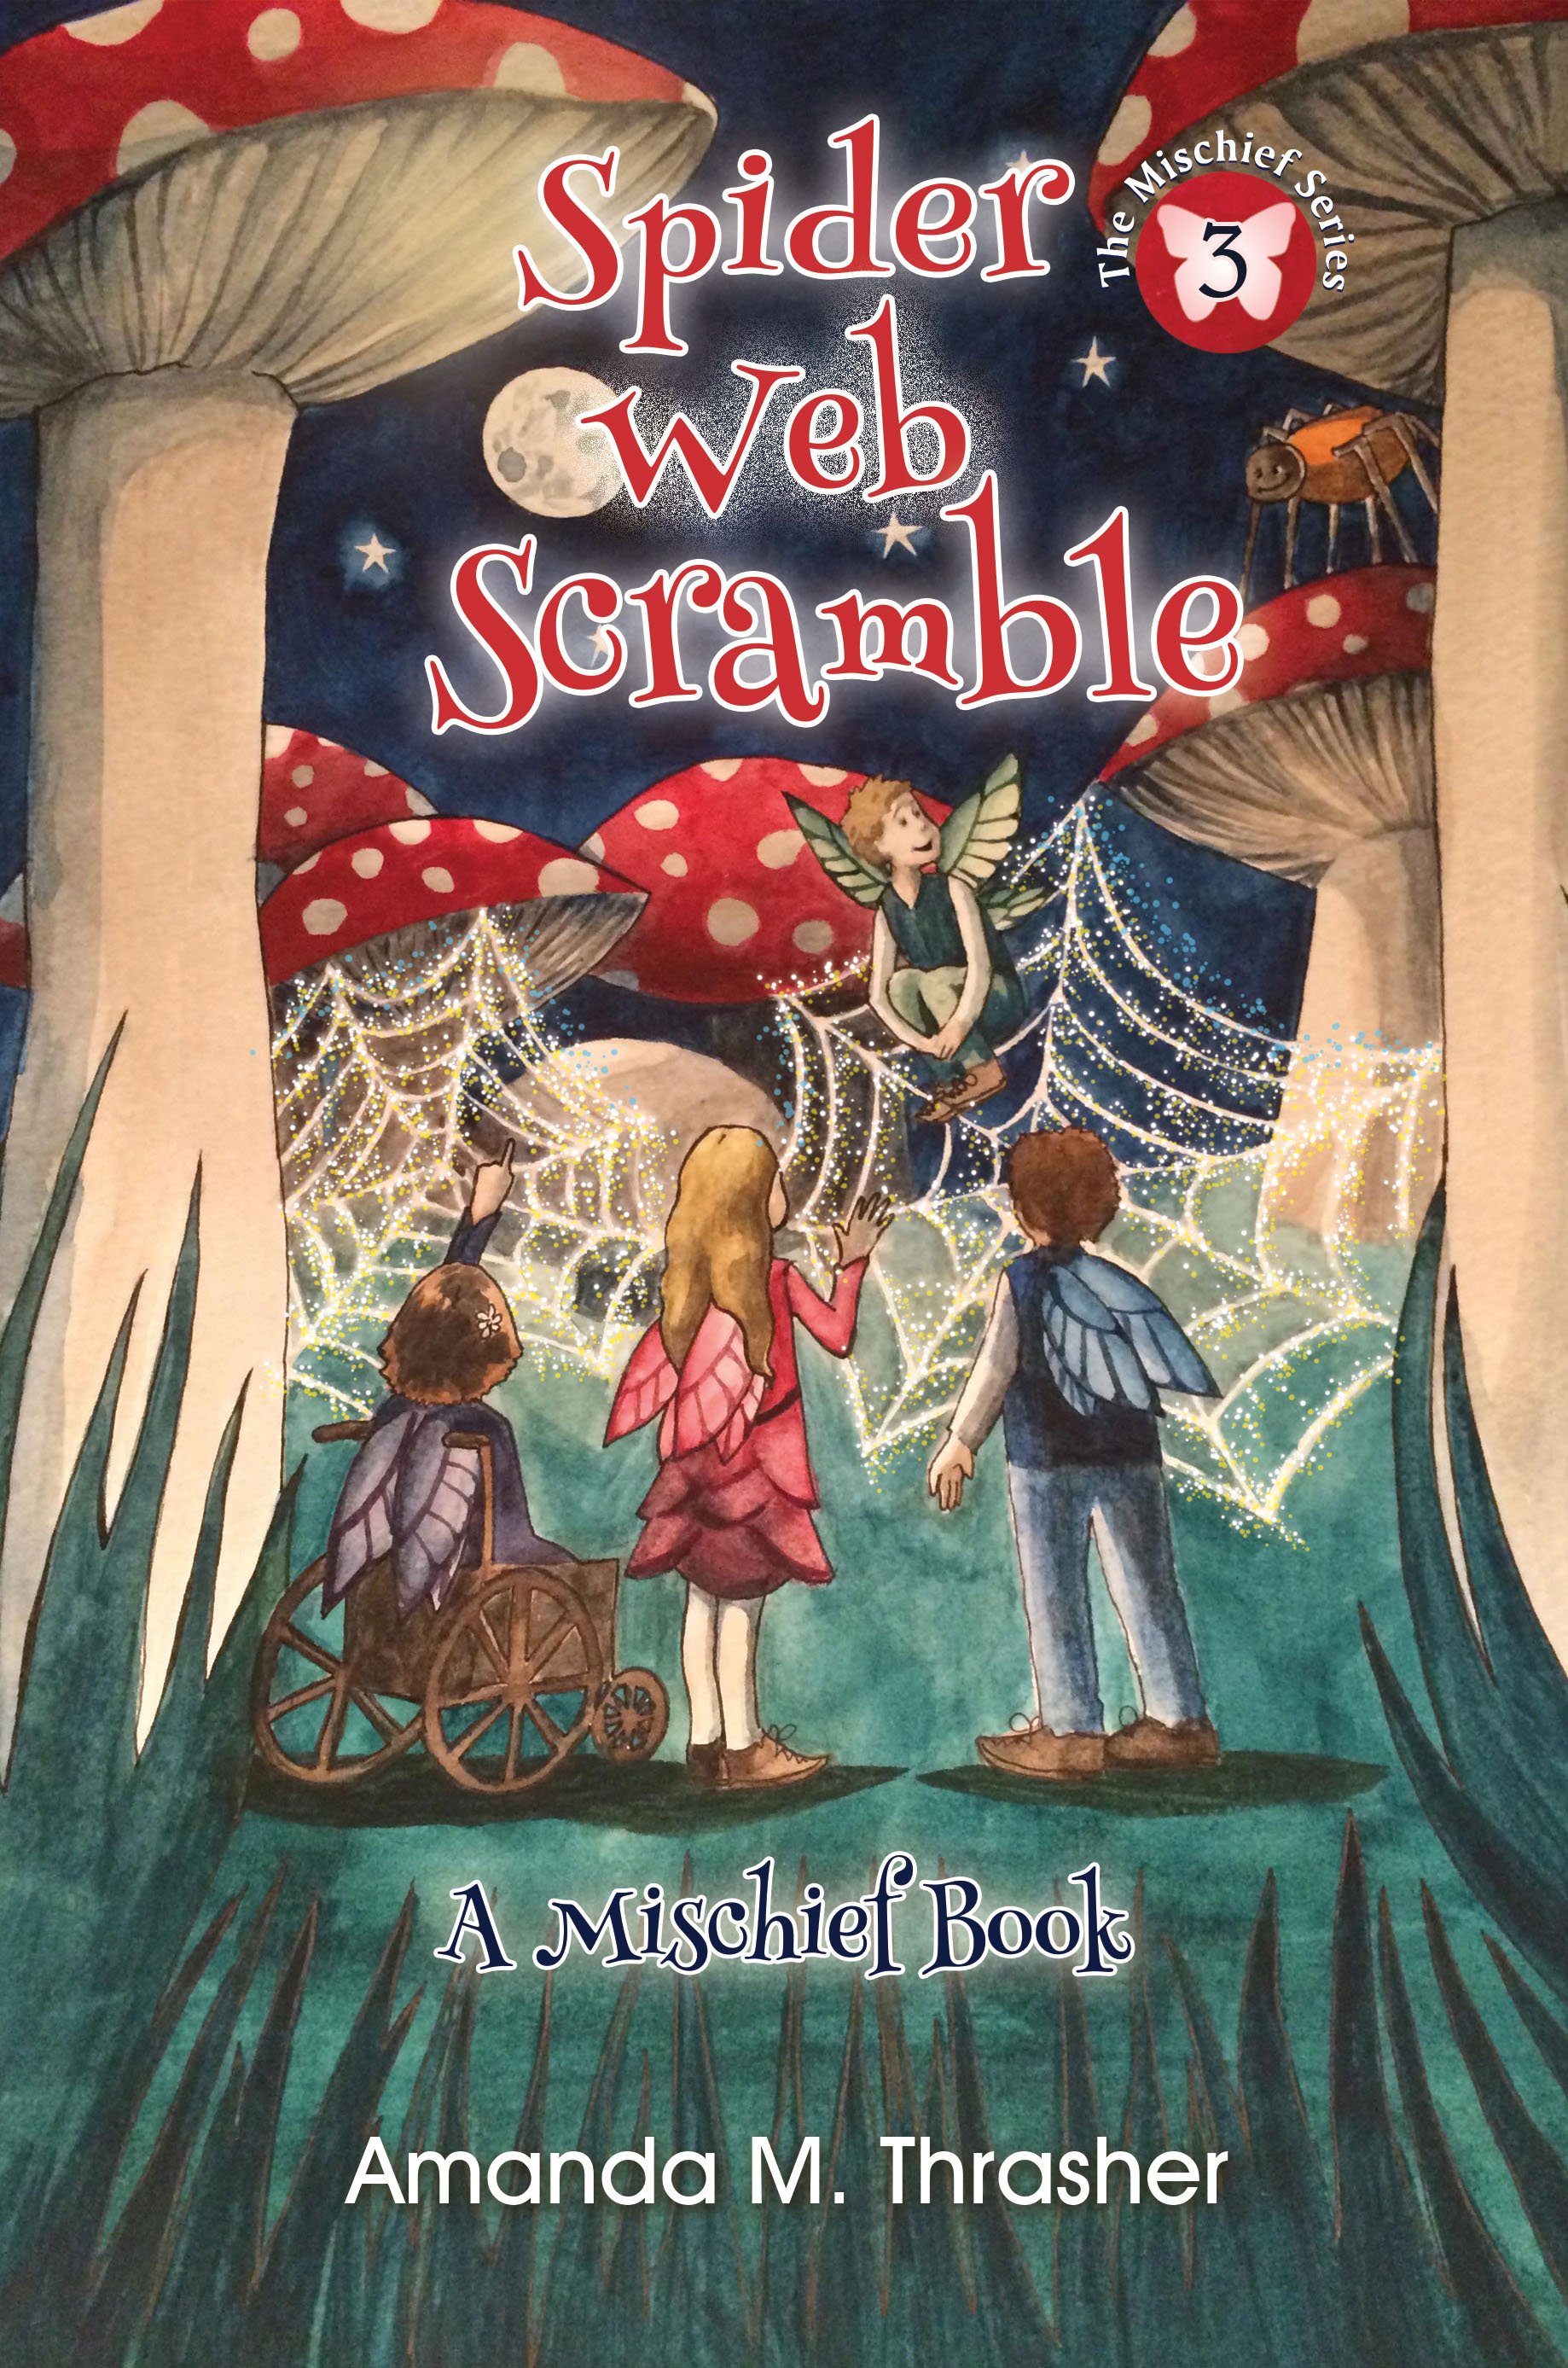 Spider Web Scramble Amanda M. Thrasher